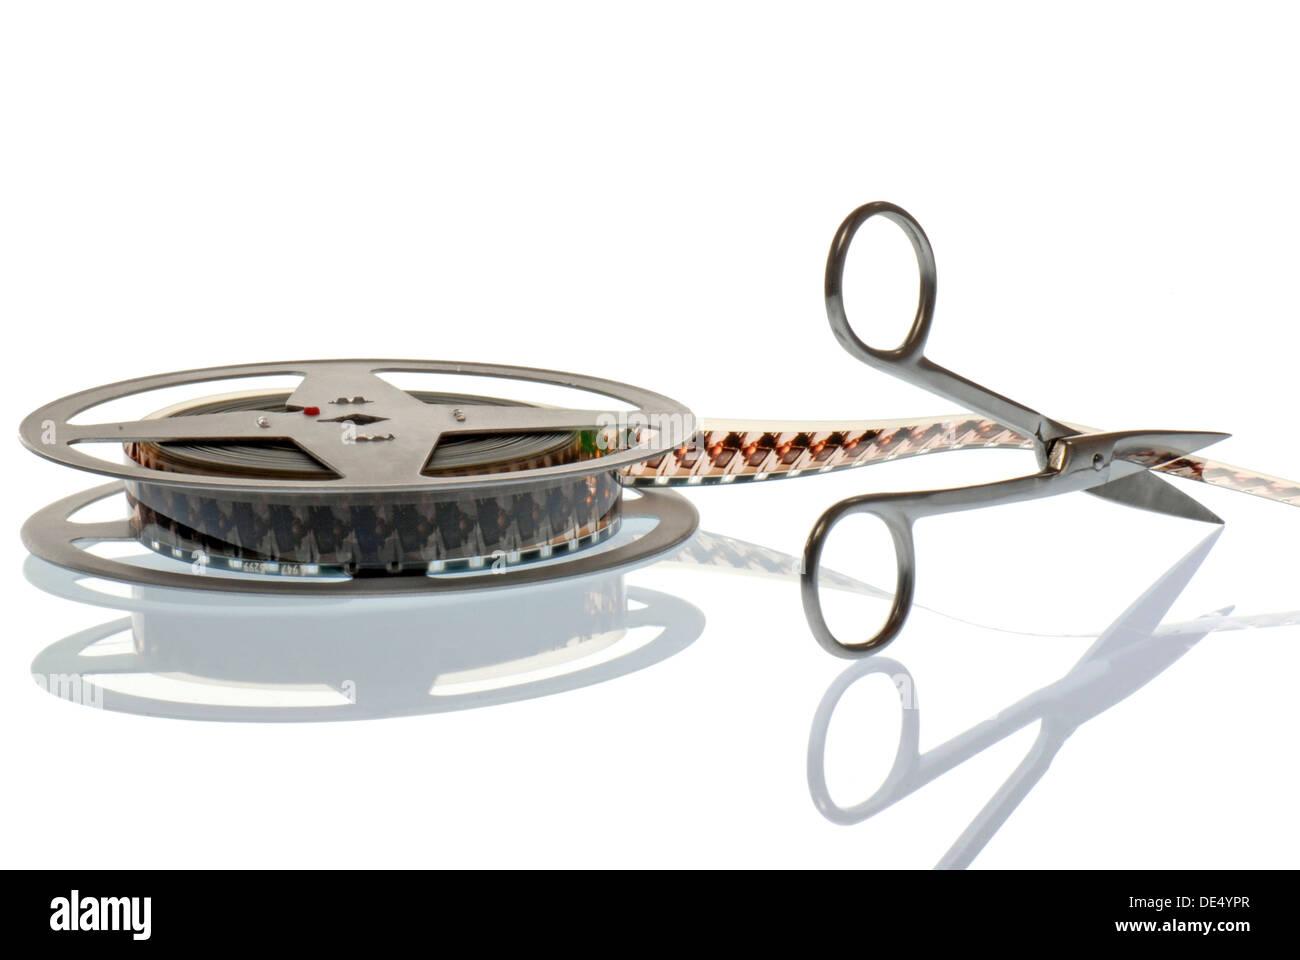 Film reel with scissors, symbolic image for film editing - Stock Image